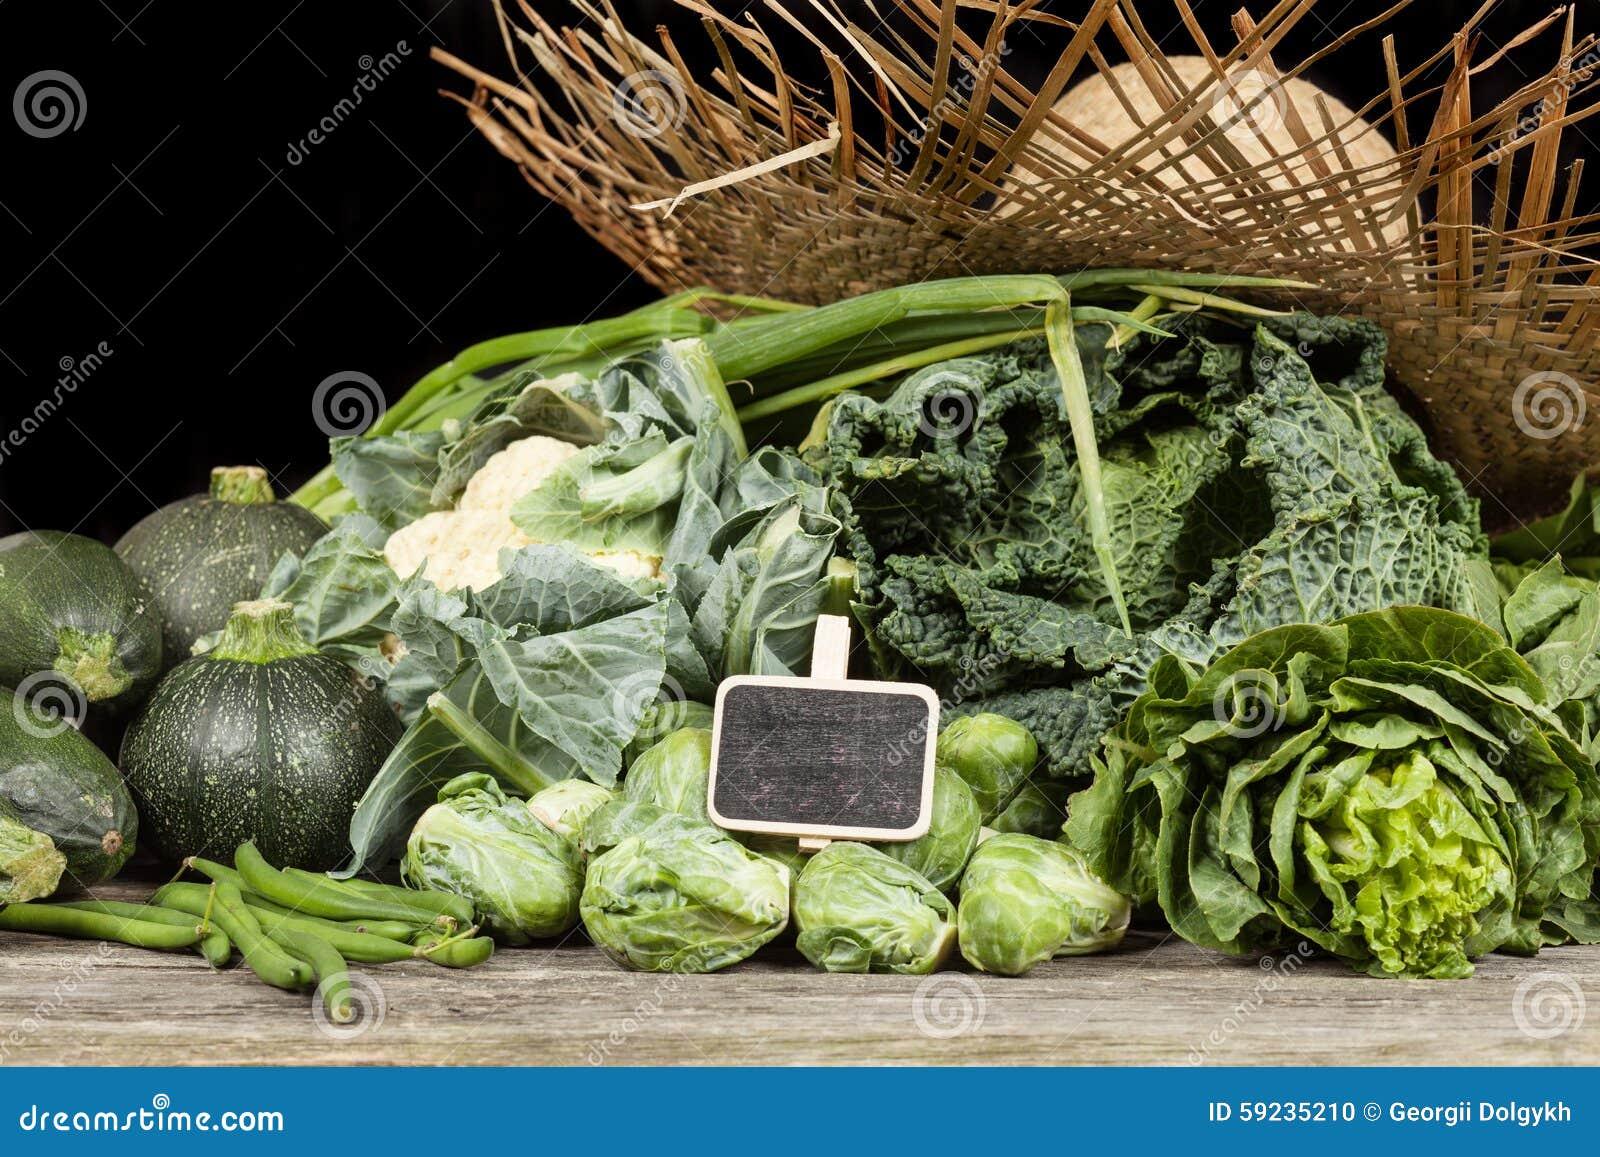 Download Surtido de verduras verdes foto de archivo. Imagen de negro - 59235210